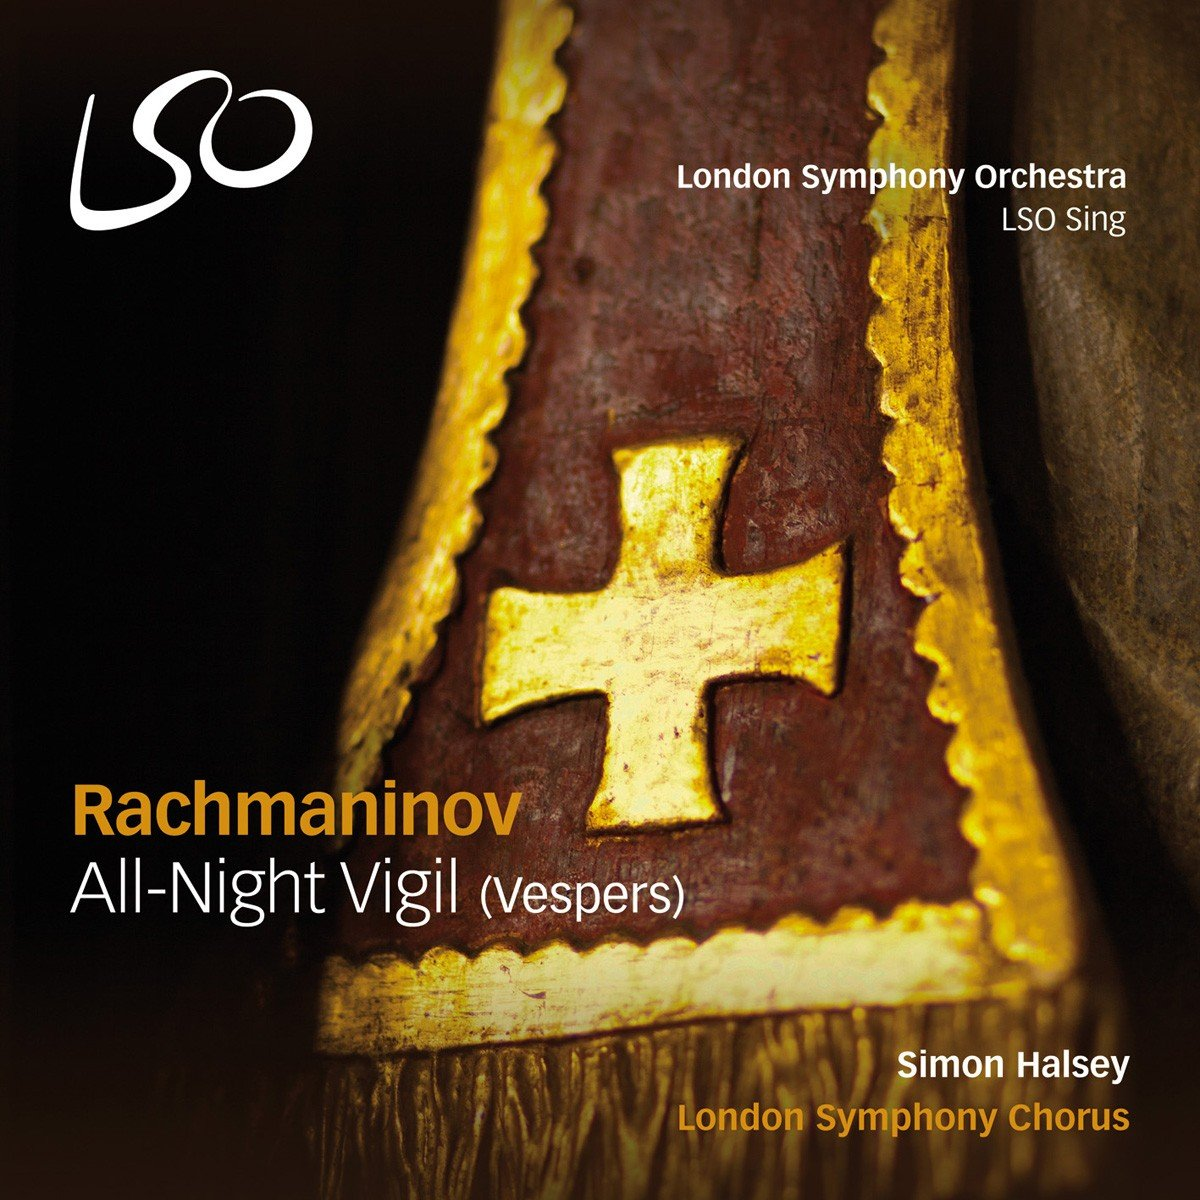 RACHMANINOV,S. / LONDON SYMPHONY CHORUS / HALSEY